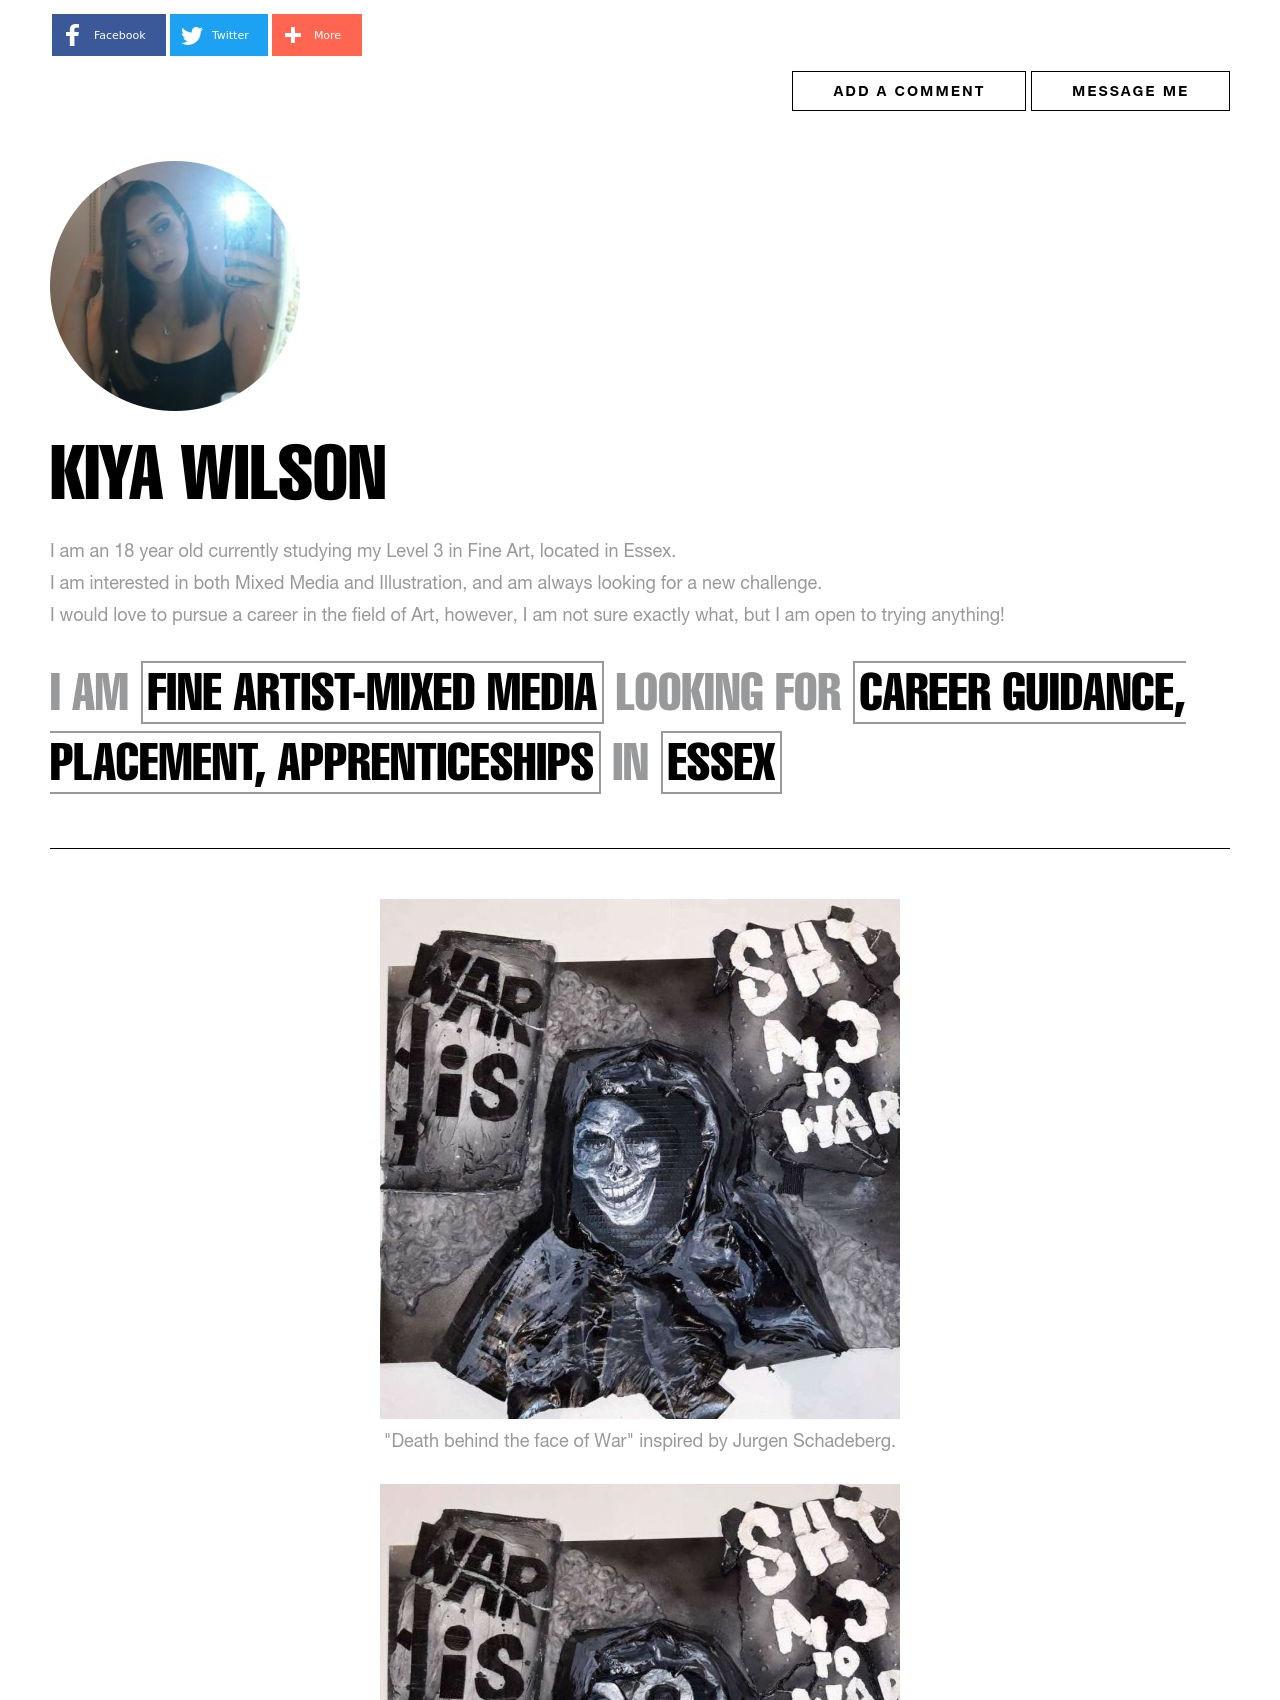 Kiya Wilson